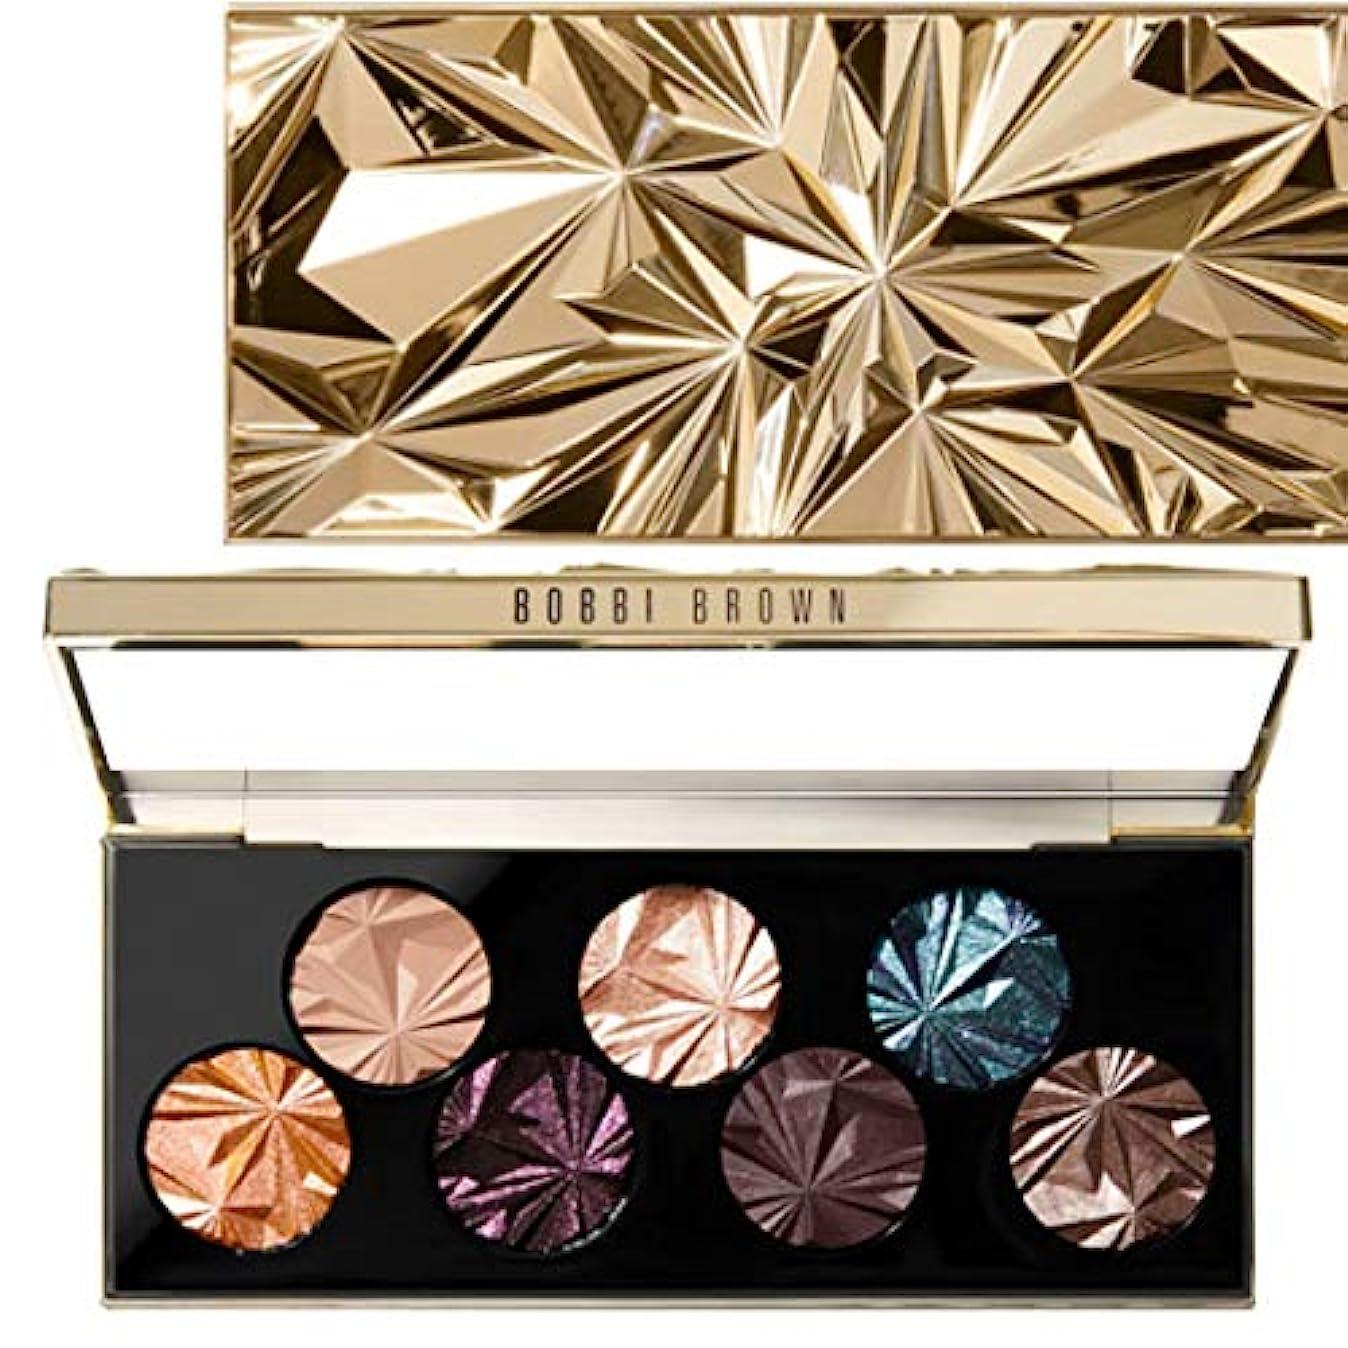 強盗硫黄生産性Bobbi Brown,limited-edition 限定版, Luxe Gems Eyeshadow Palette [海外直送品] [並行輸入品]